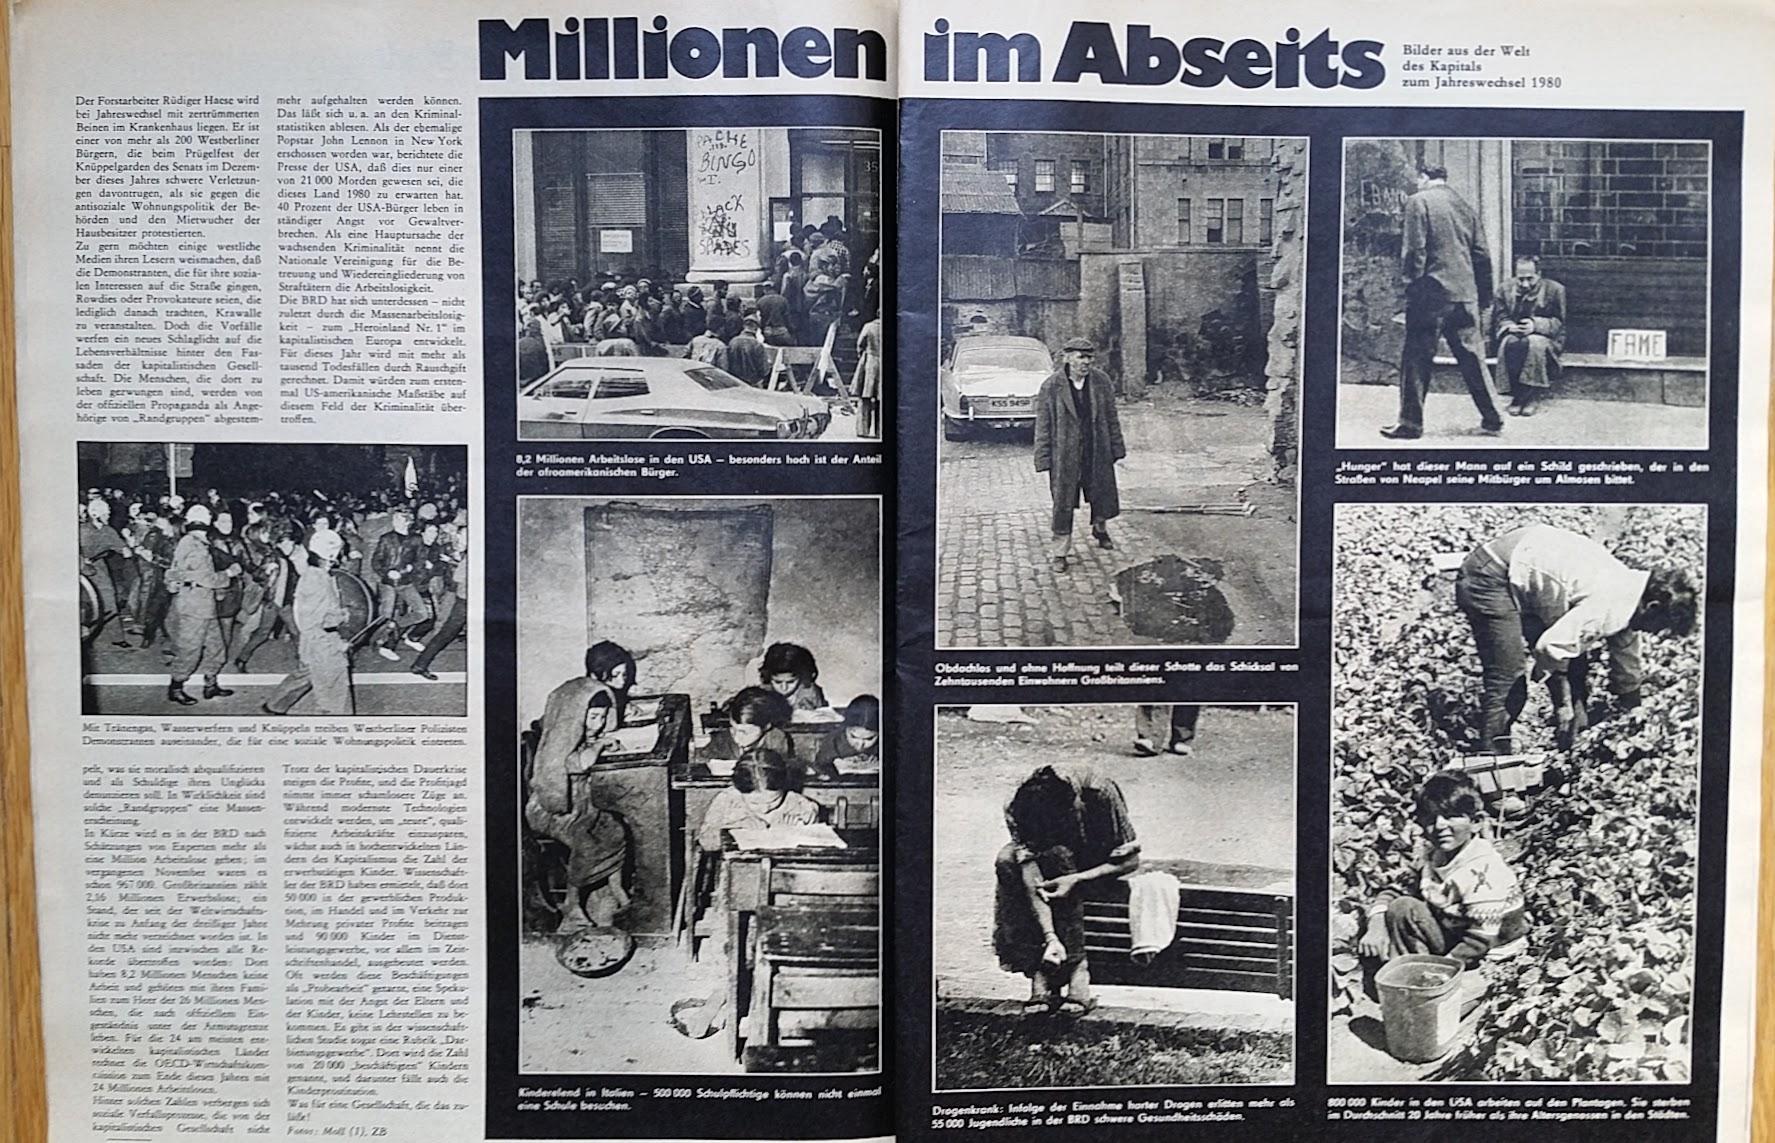 NBI - Neue Berliner Illustrierte 52/80 - 5.-11. Januar 1981